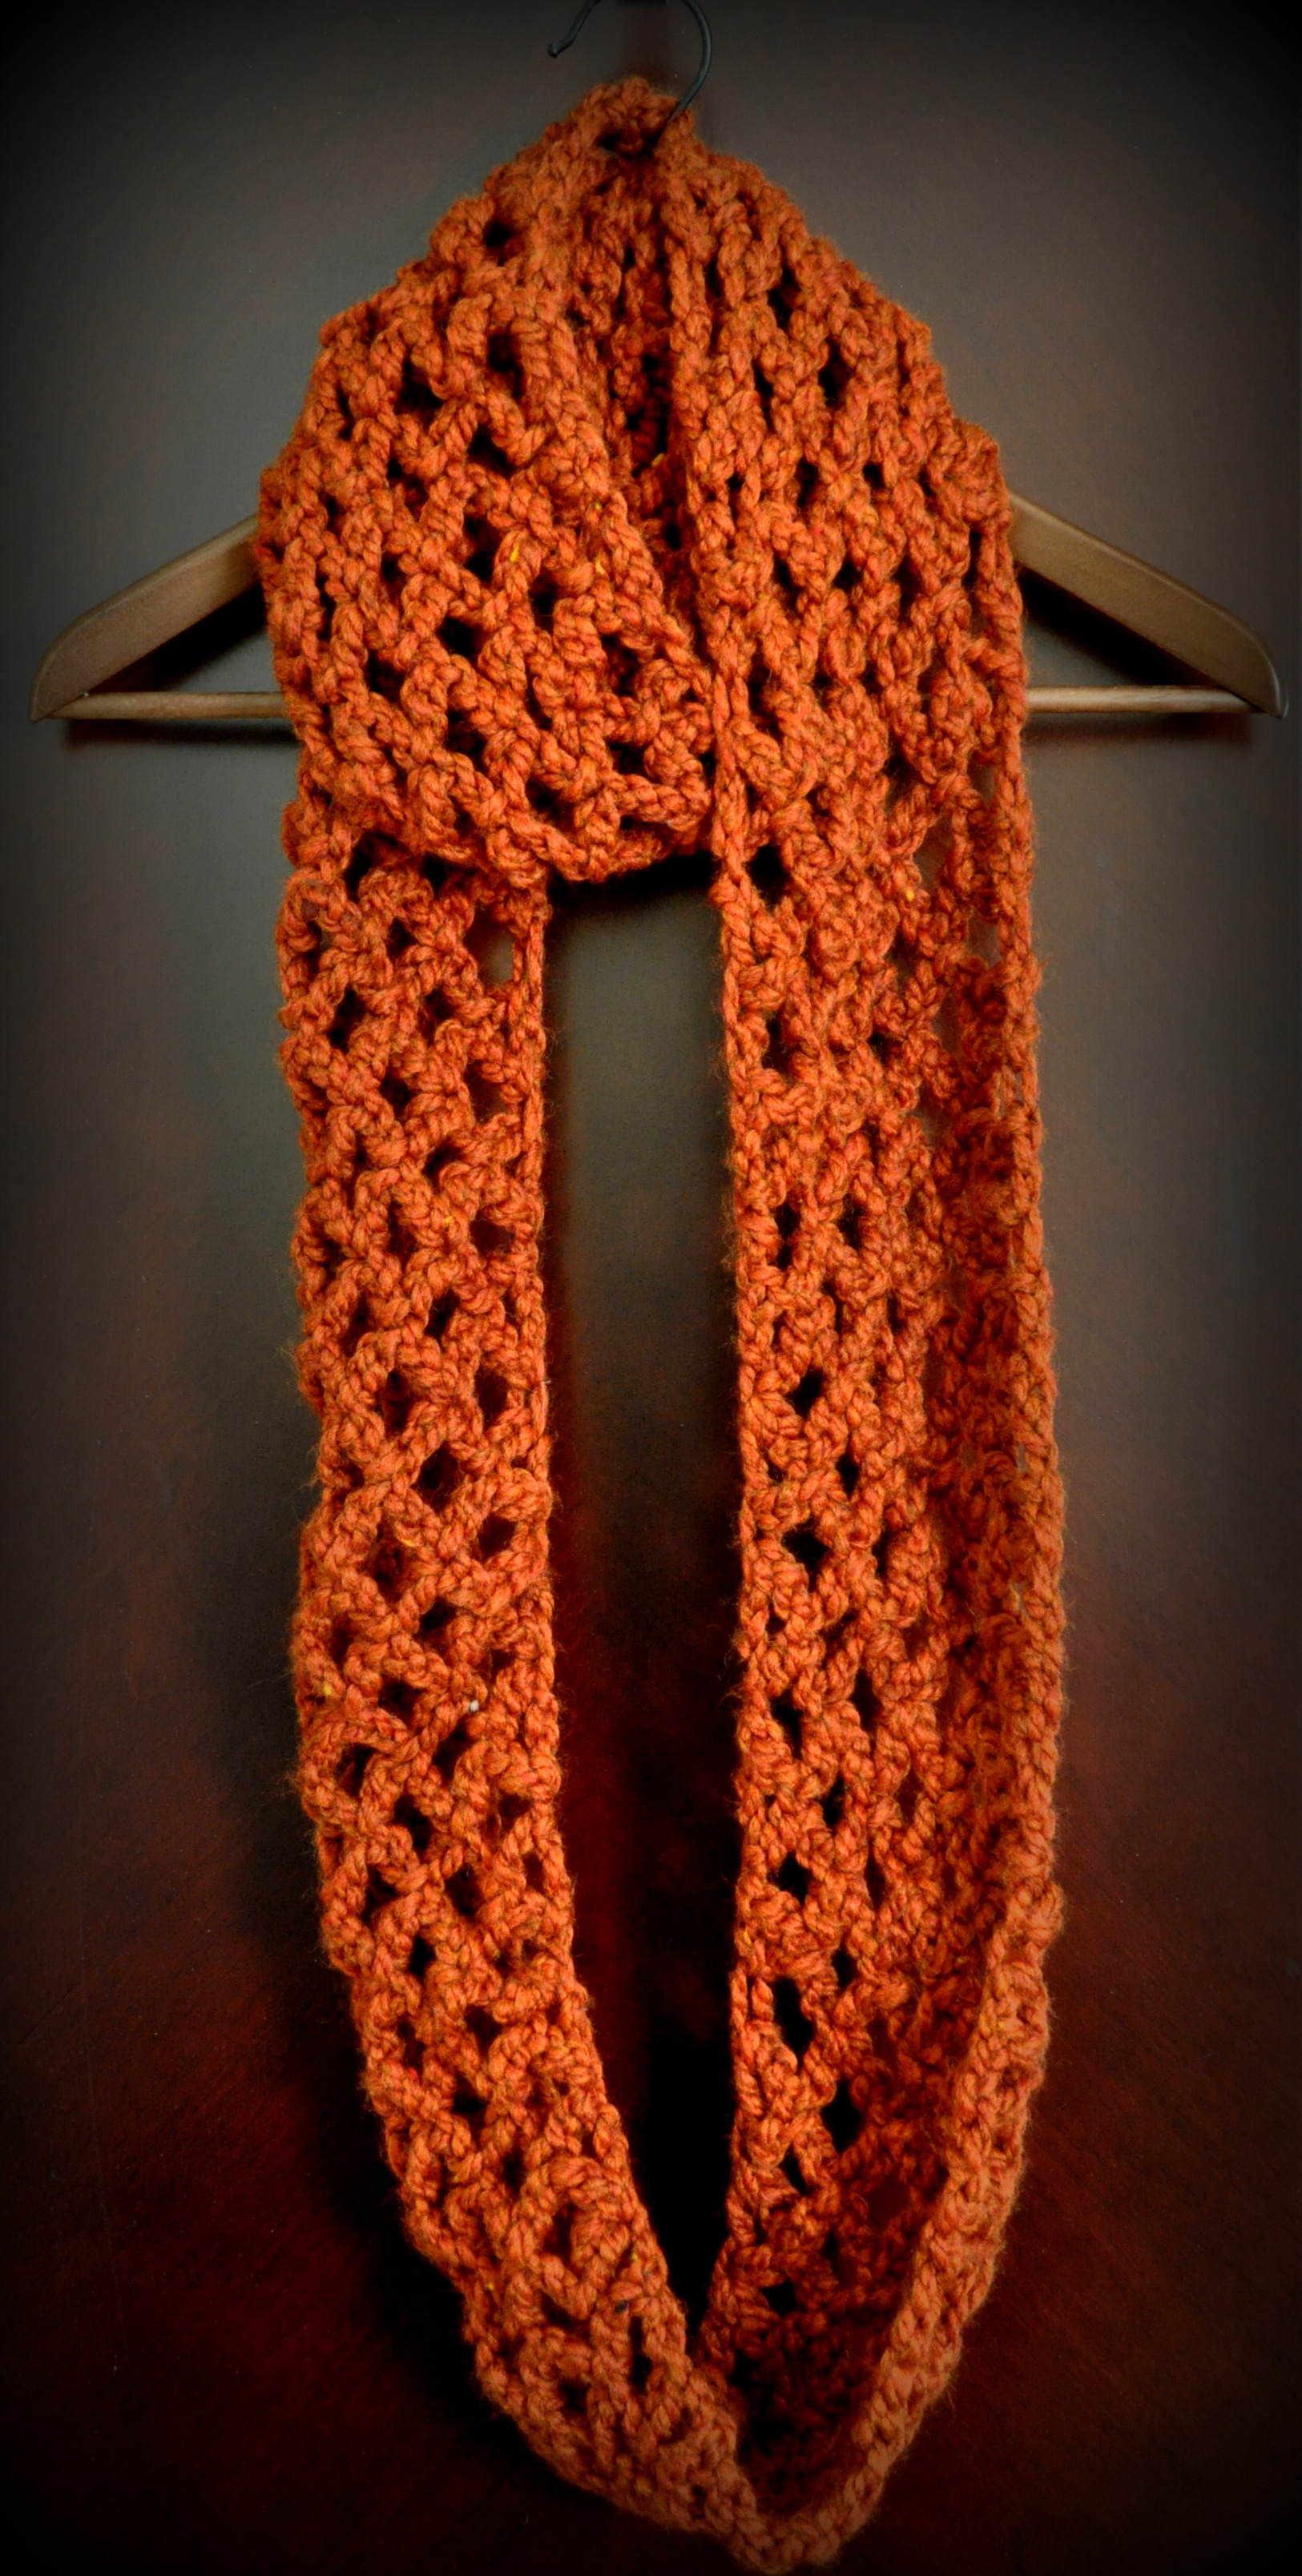 Free Pattern: Diamond Lattice Chain Crochet Infinity Scarf